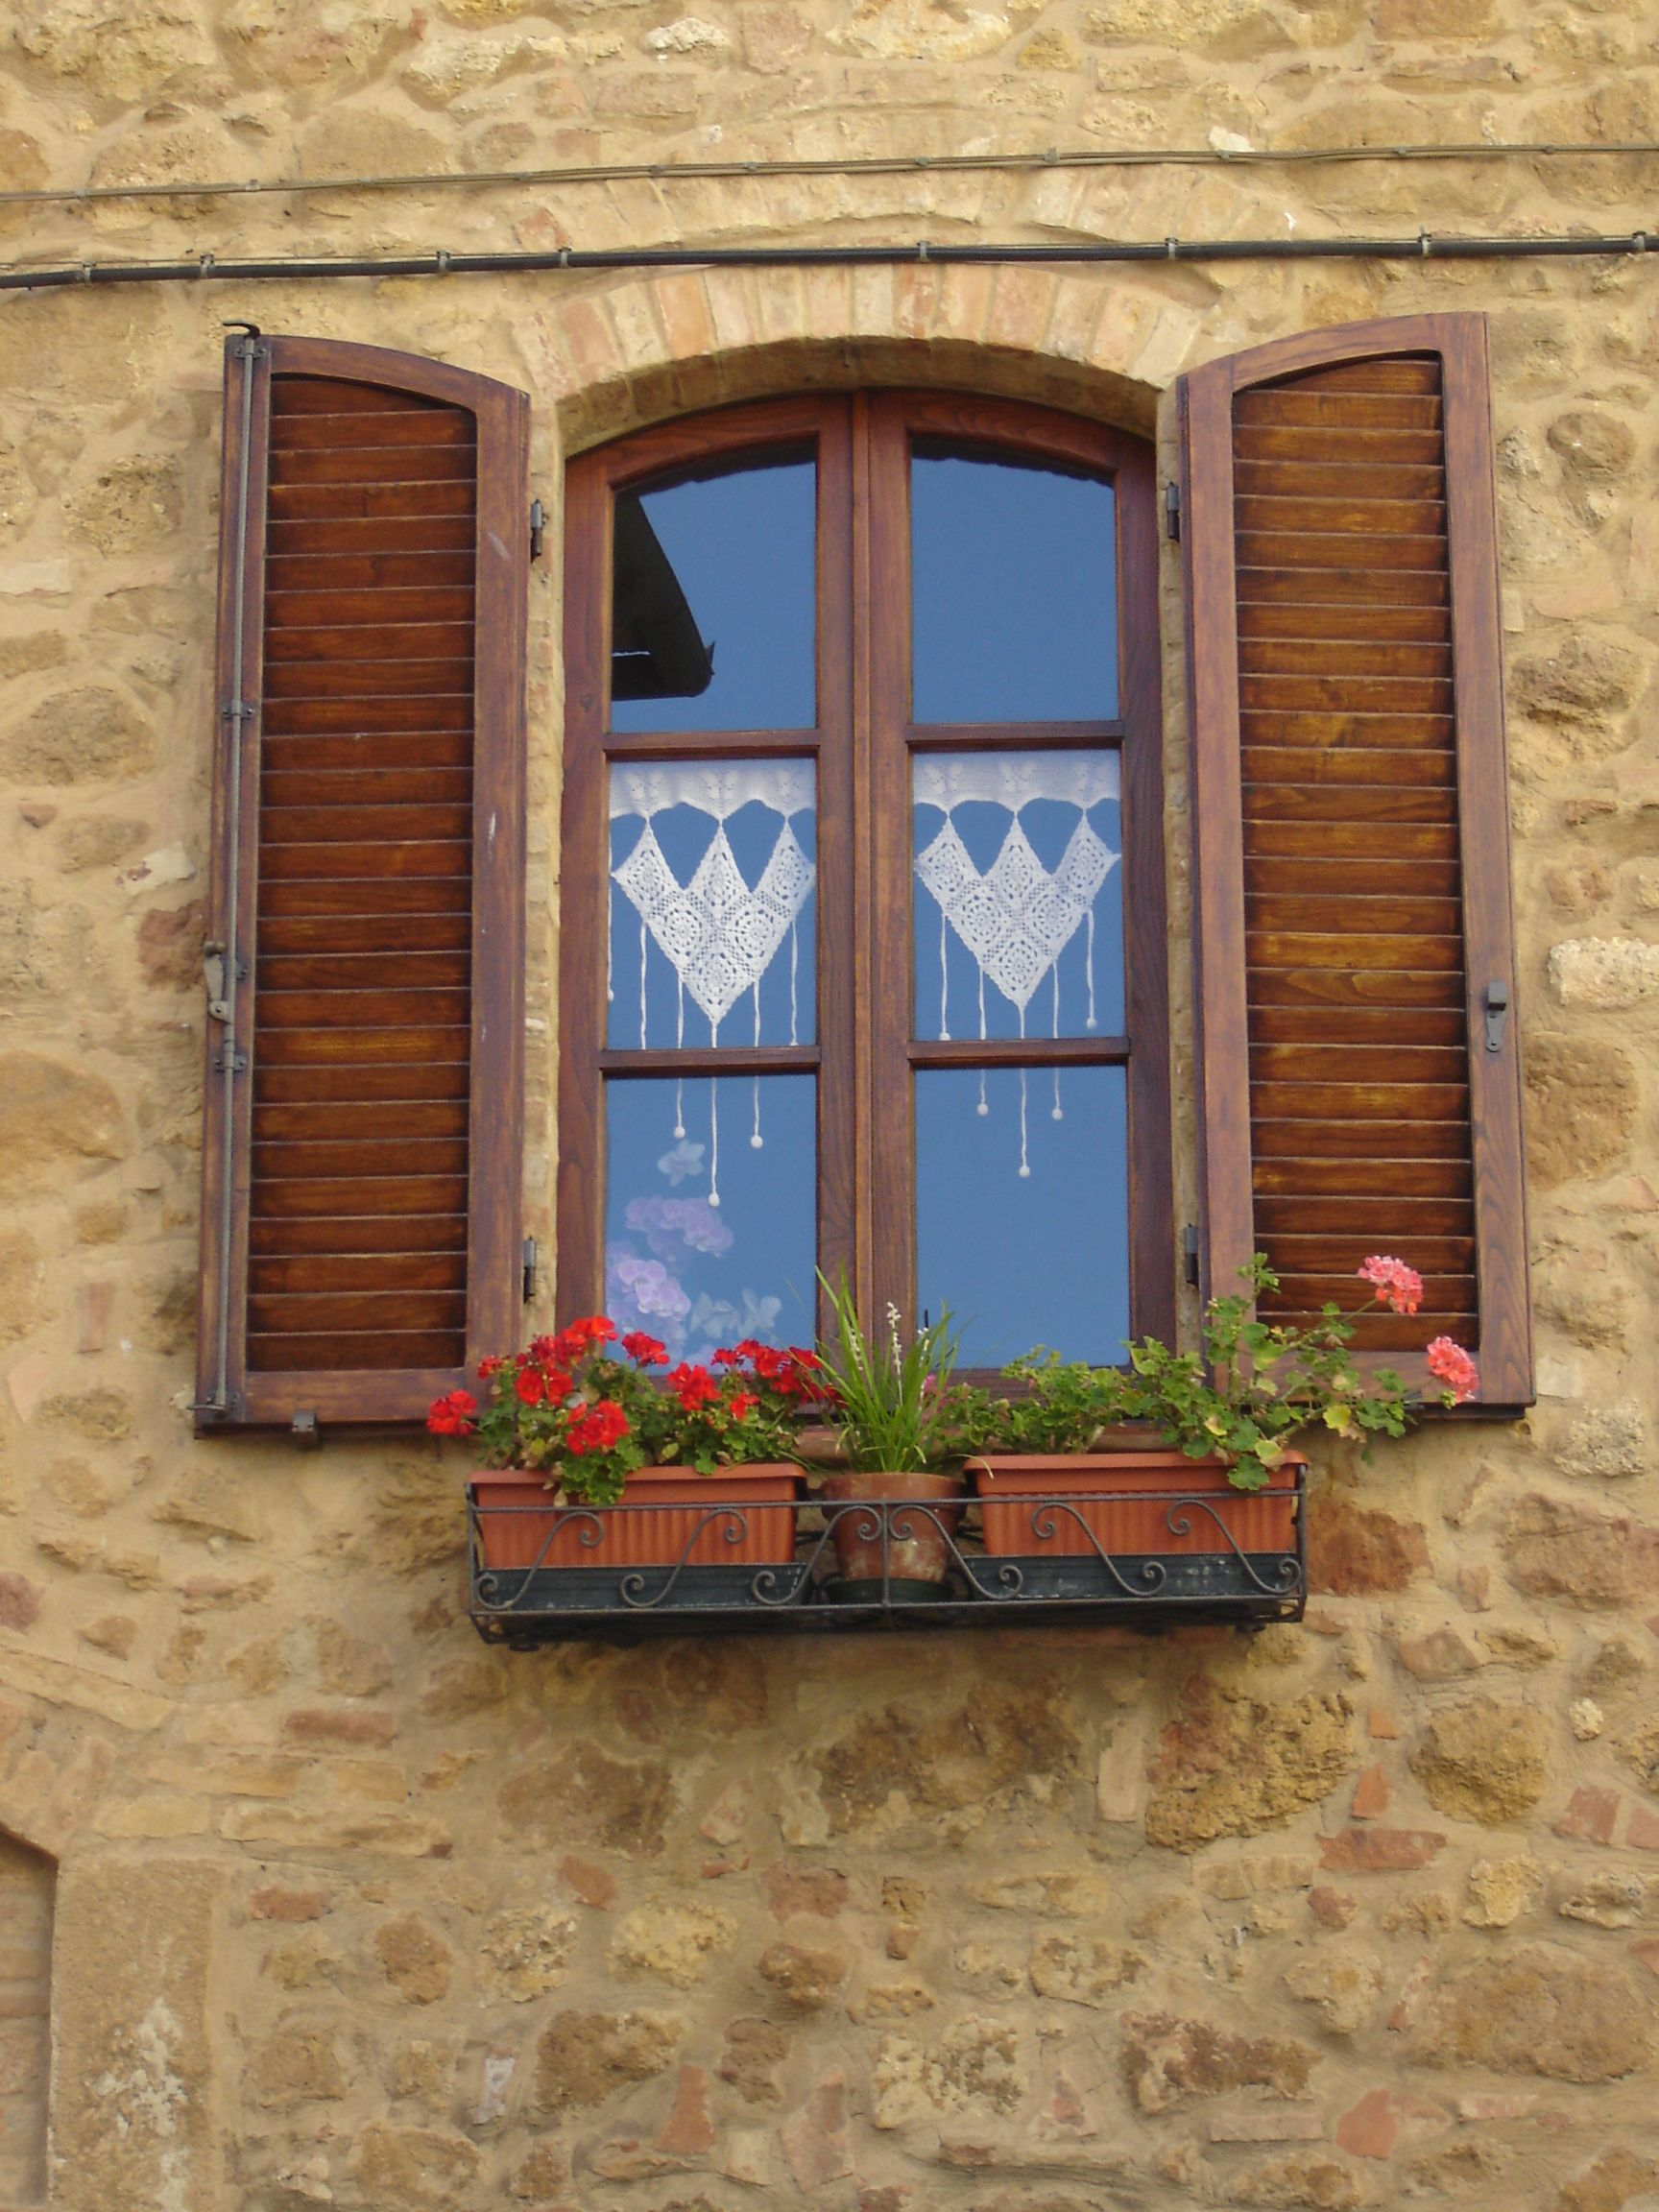 Window in Pienza,province of Siena ,heart shaped lace,Tuscany region Italy